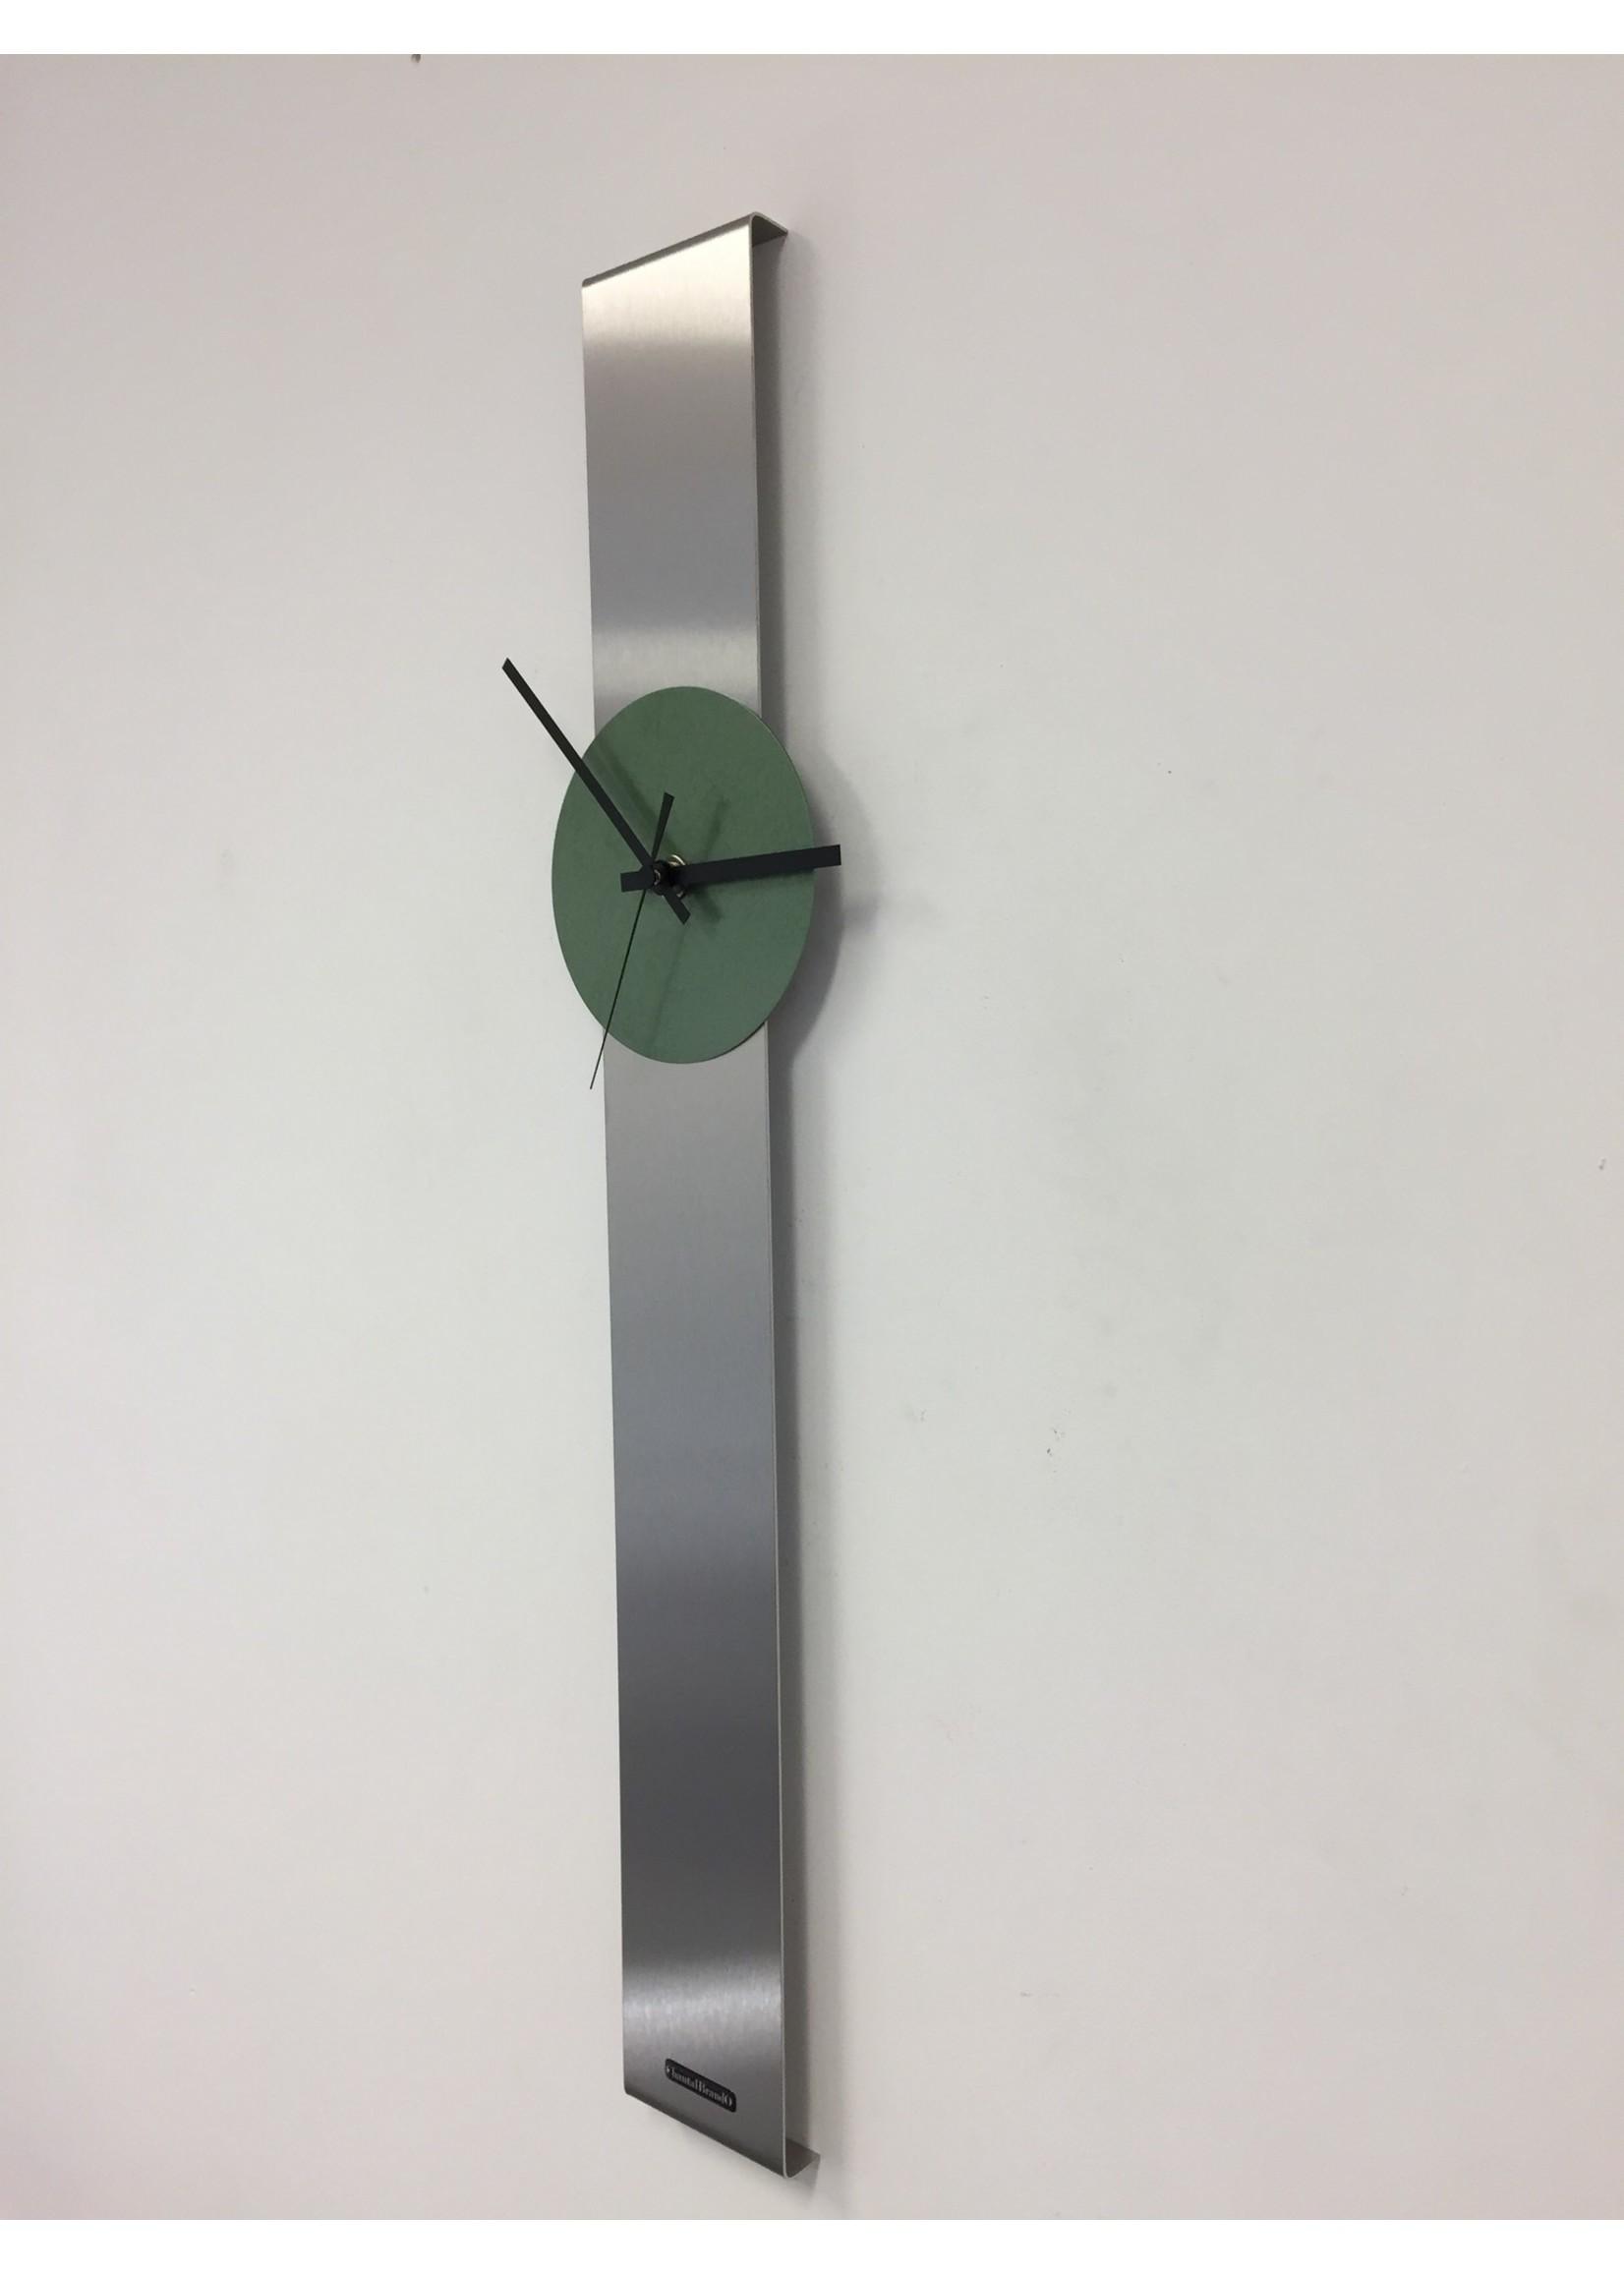 Klokkendiscounter Wandklok SUMMIT MODERN DUTCH DESIGN GREEN